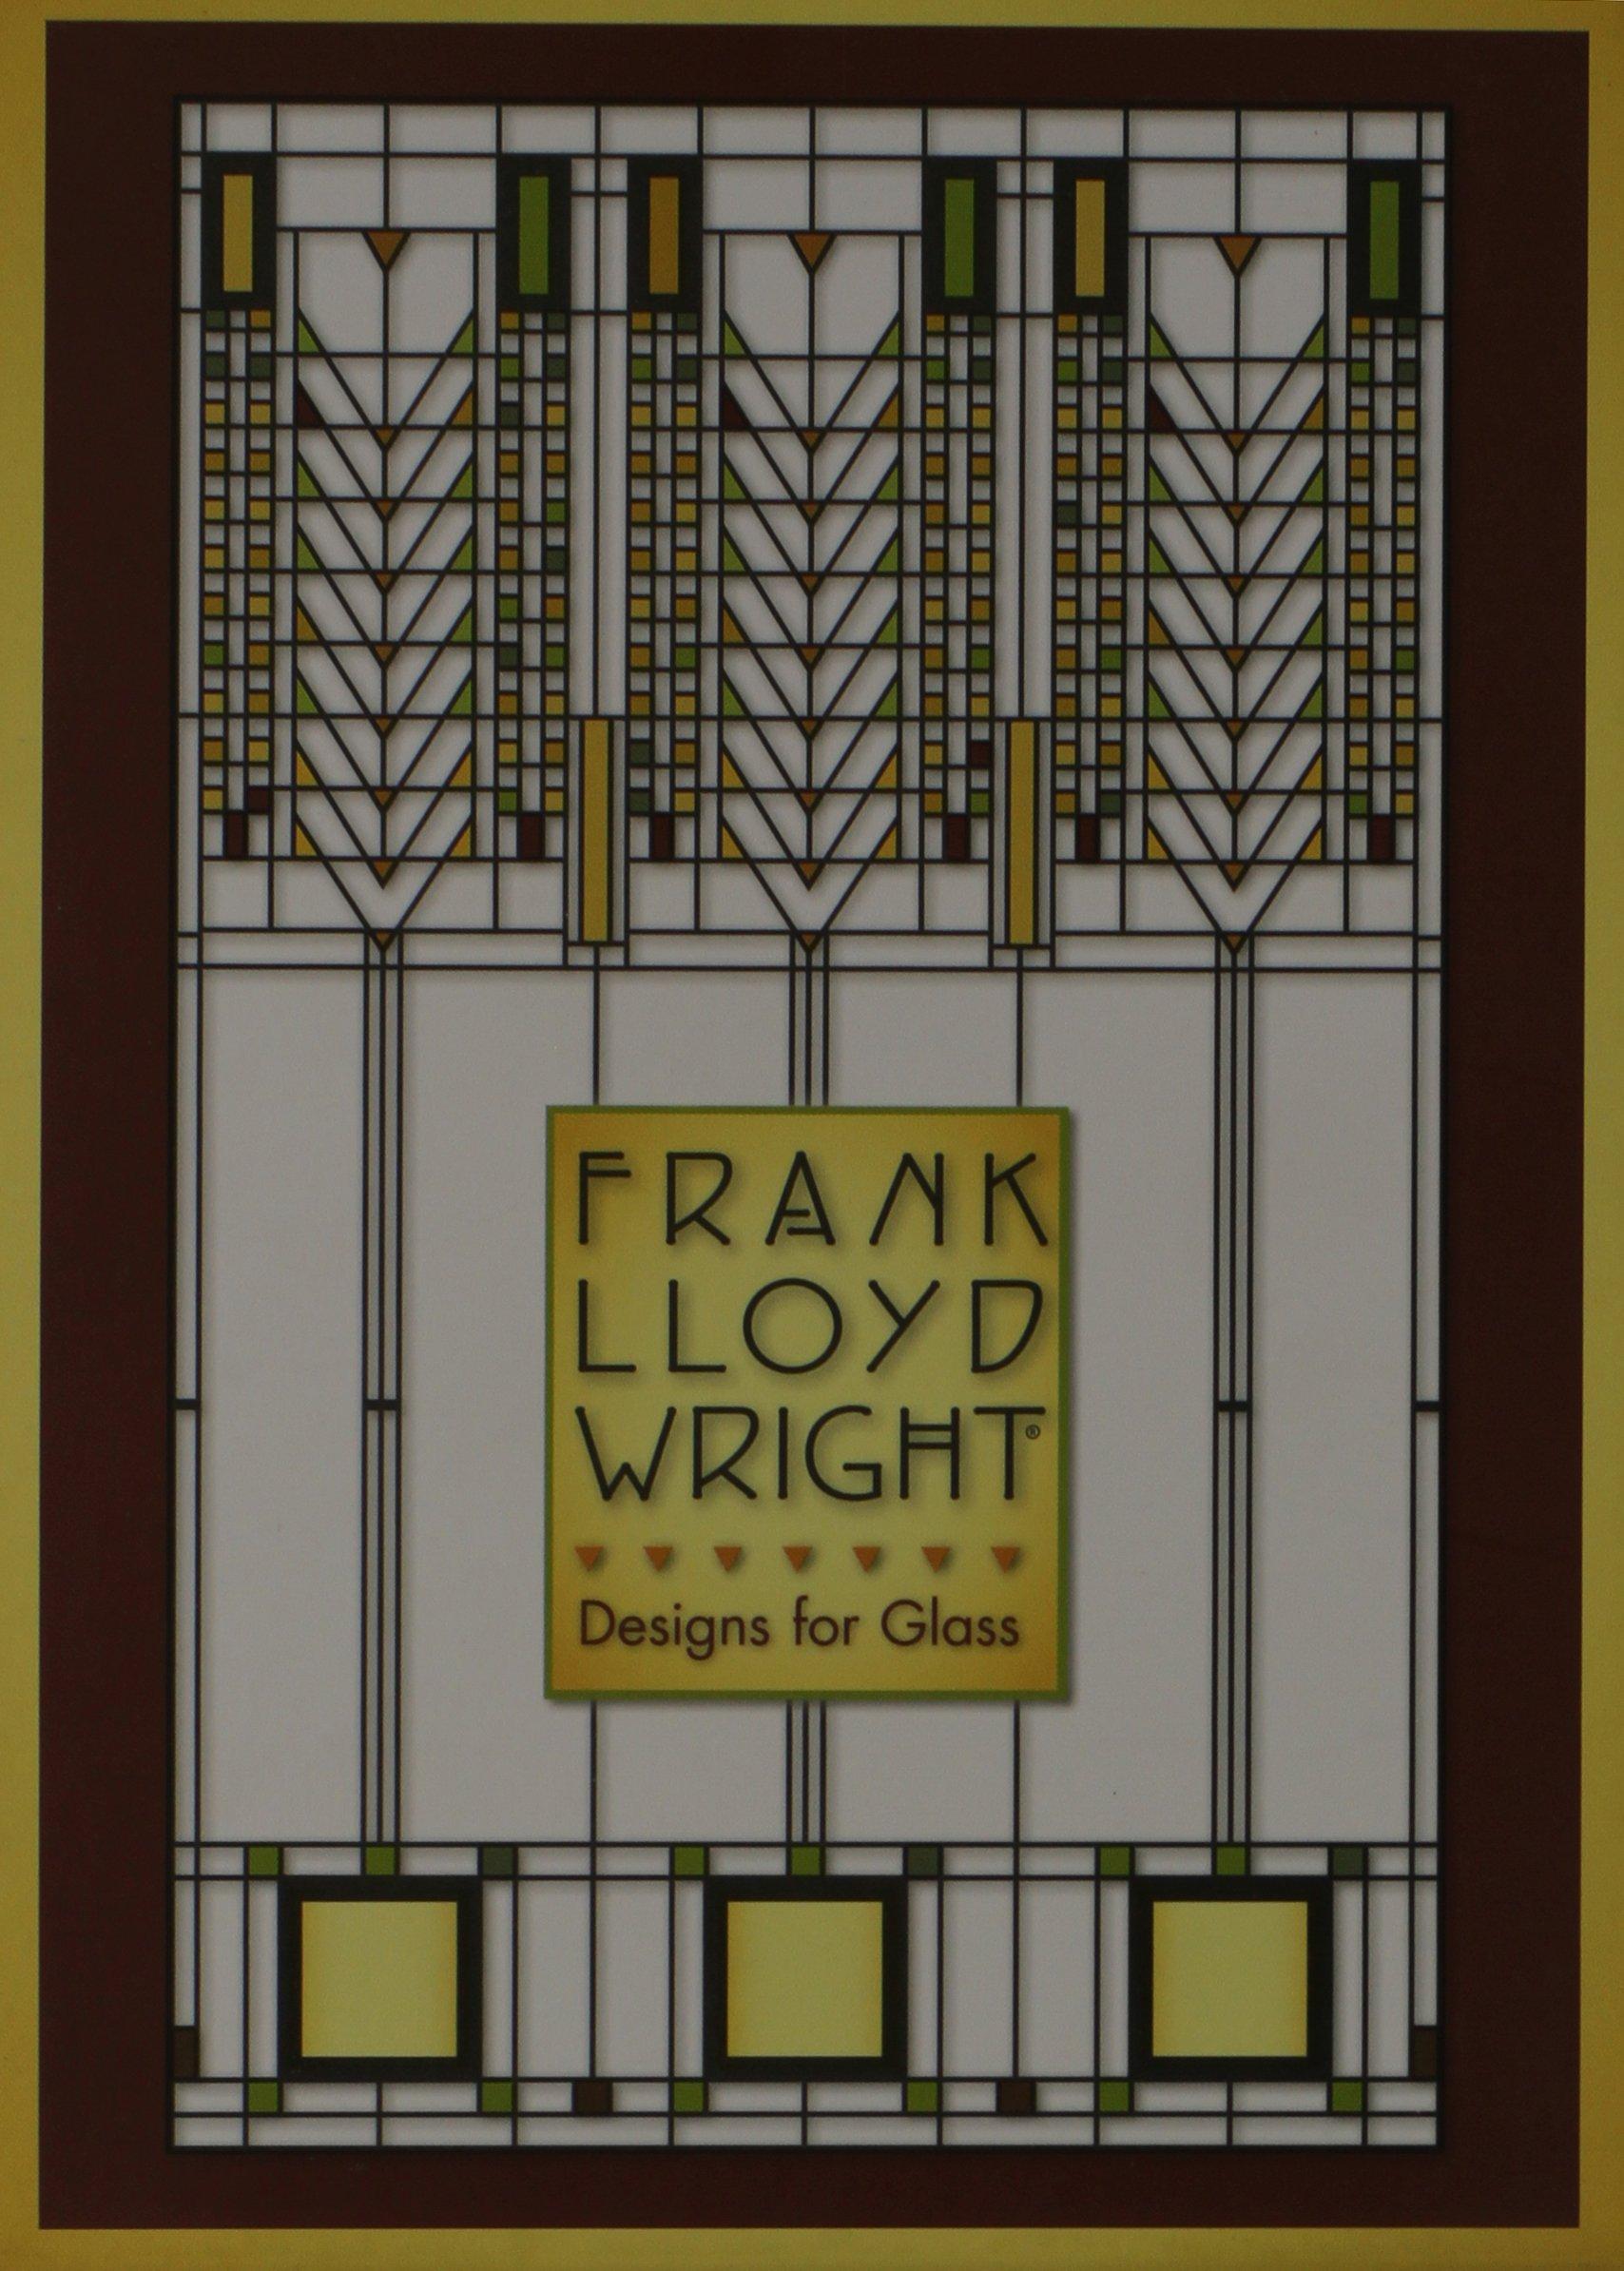 frank lloyd wright designs for glass boxed note cards frank lloyd